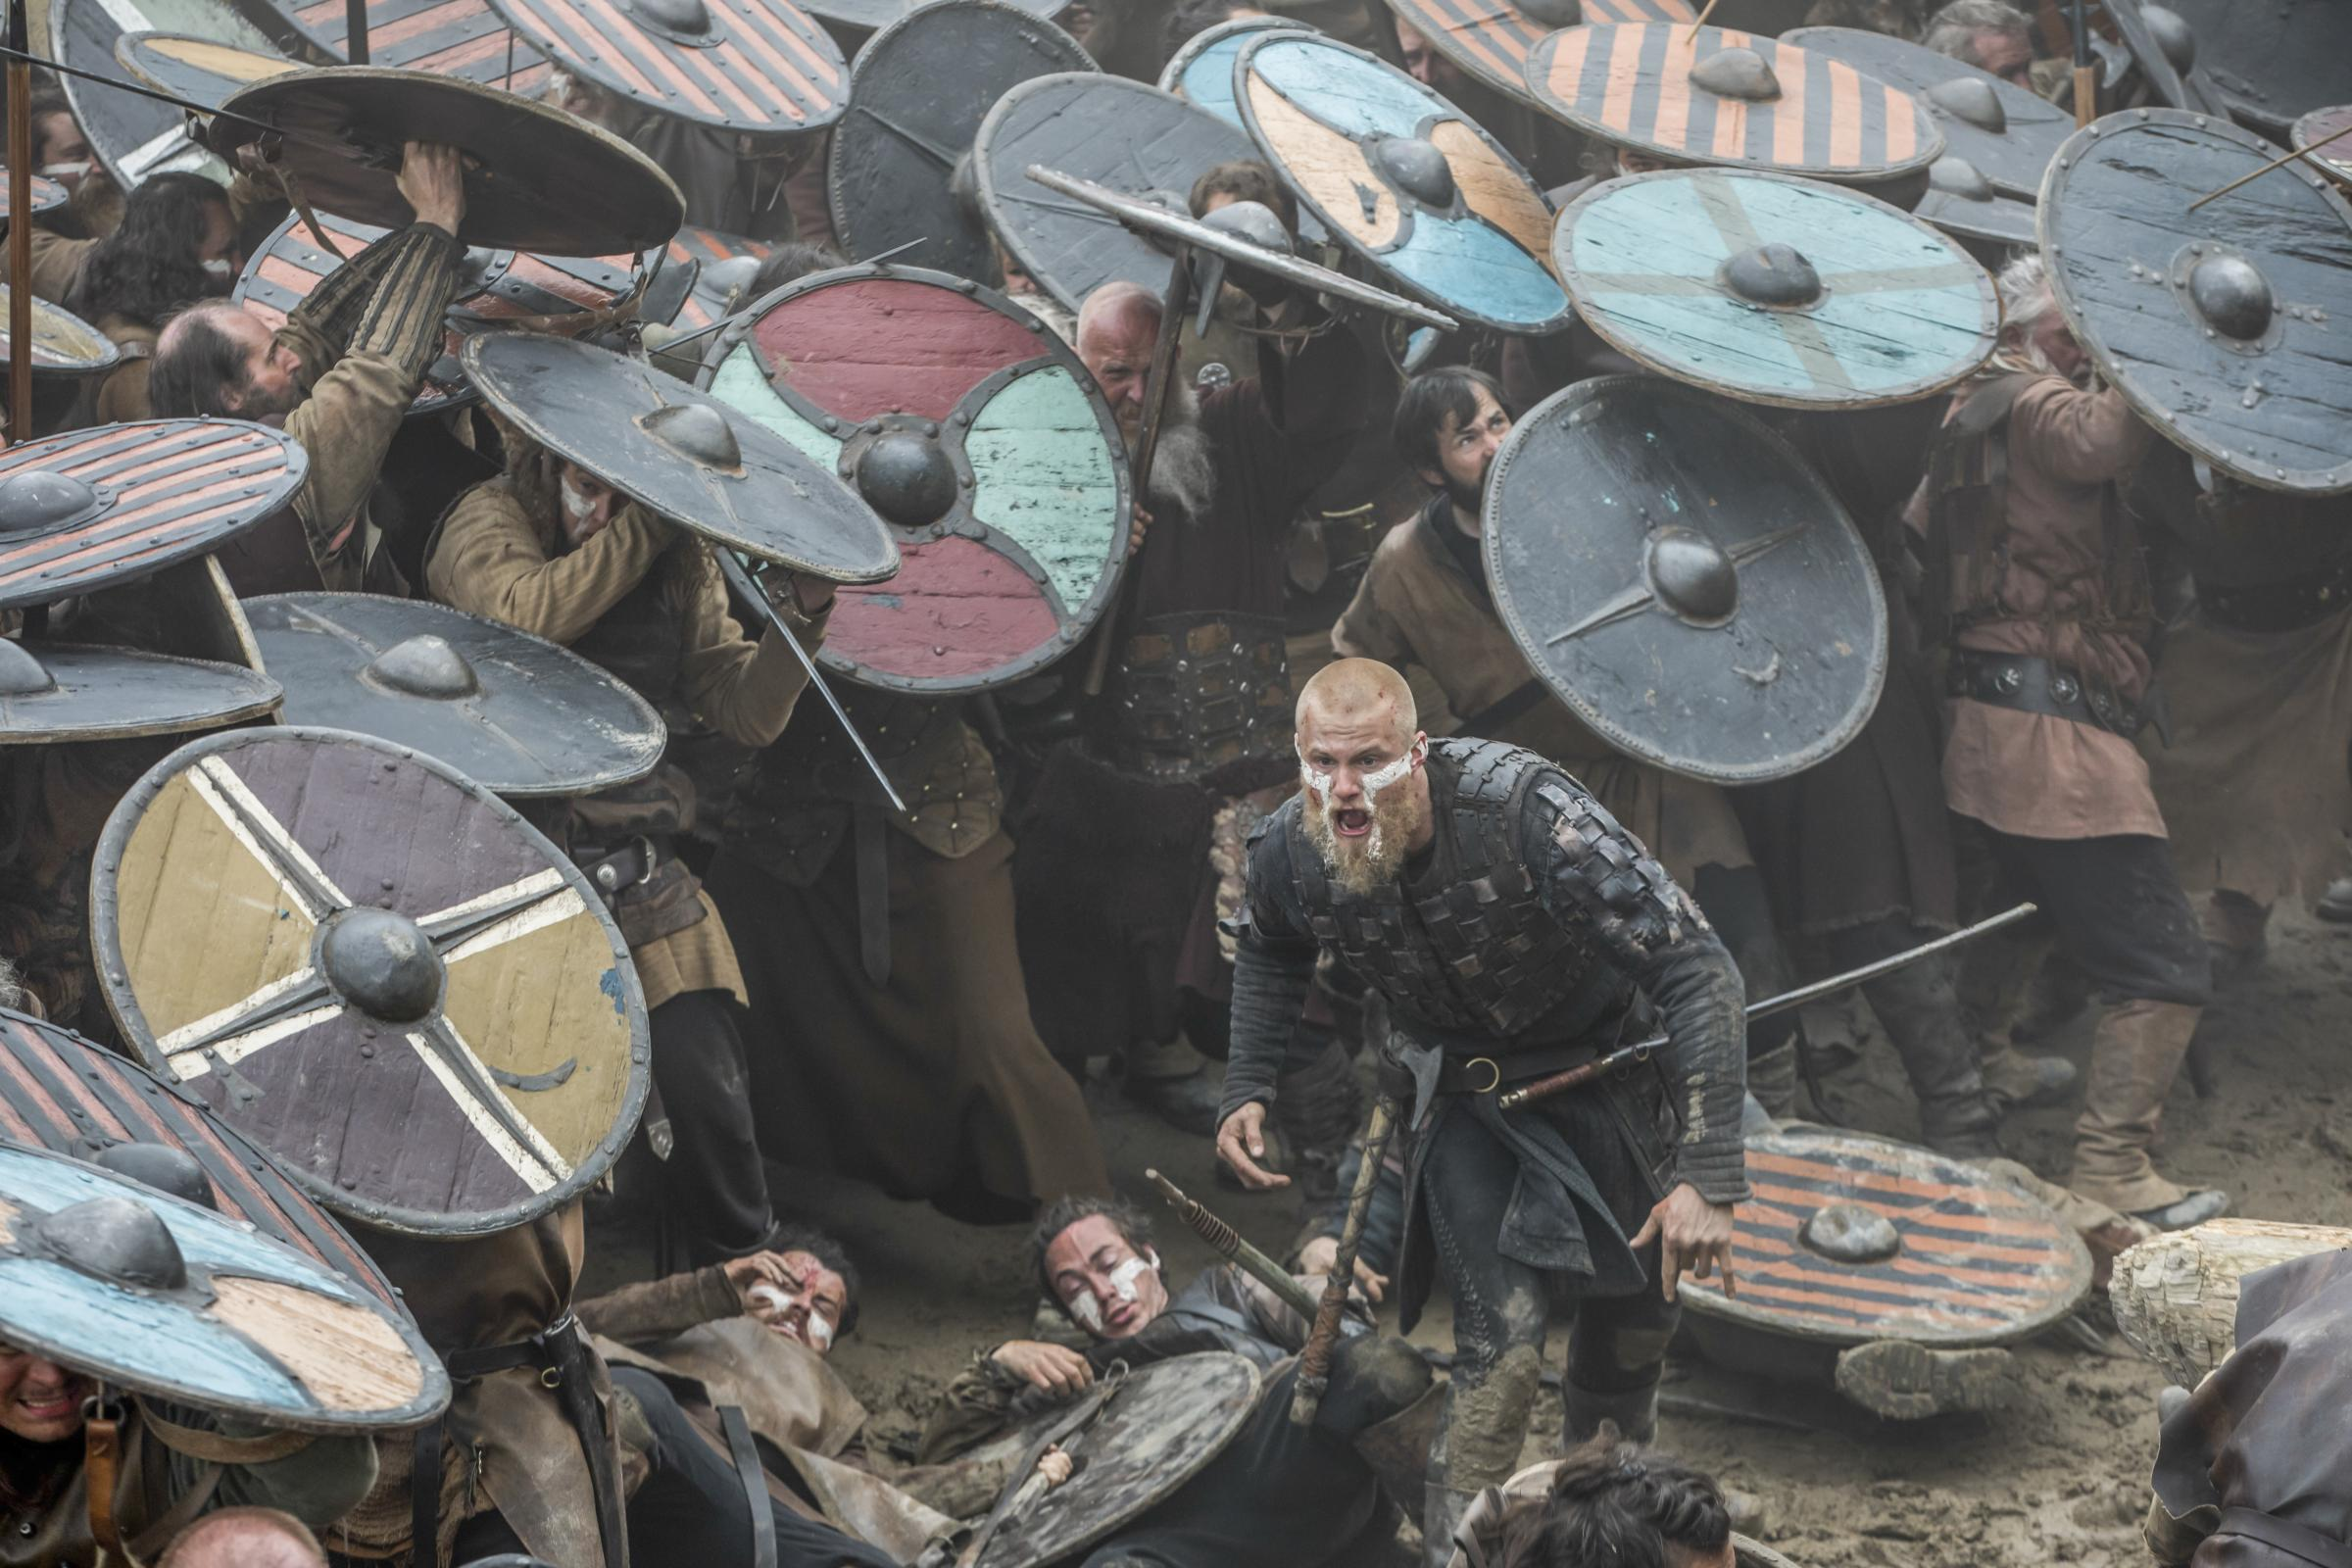 Writer of TV's Vikings and The Tudors on how Bradford teacher shaped his career